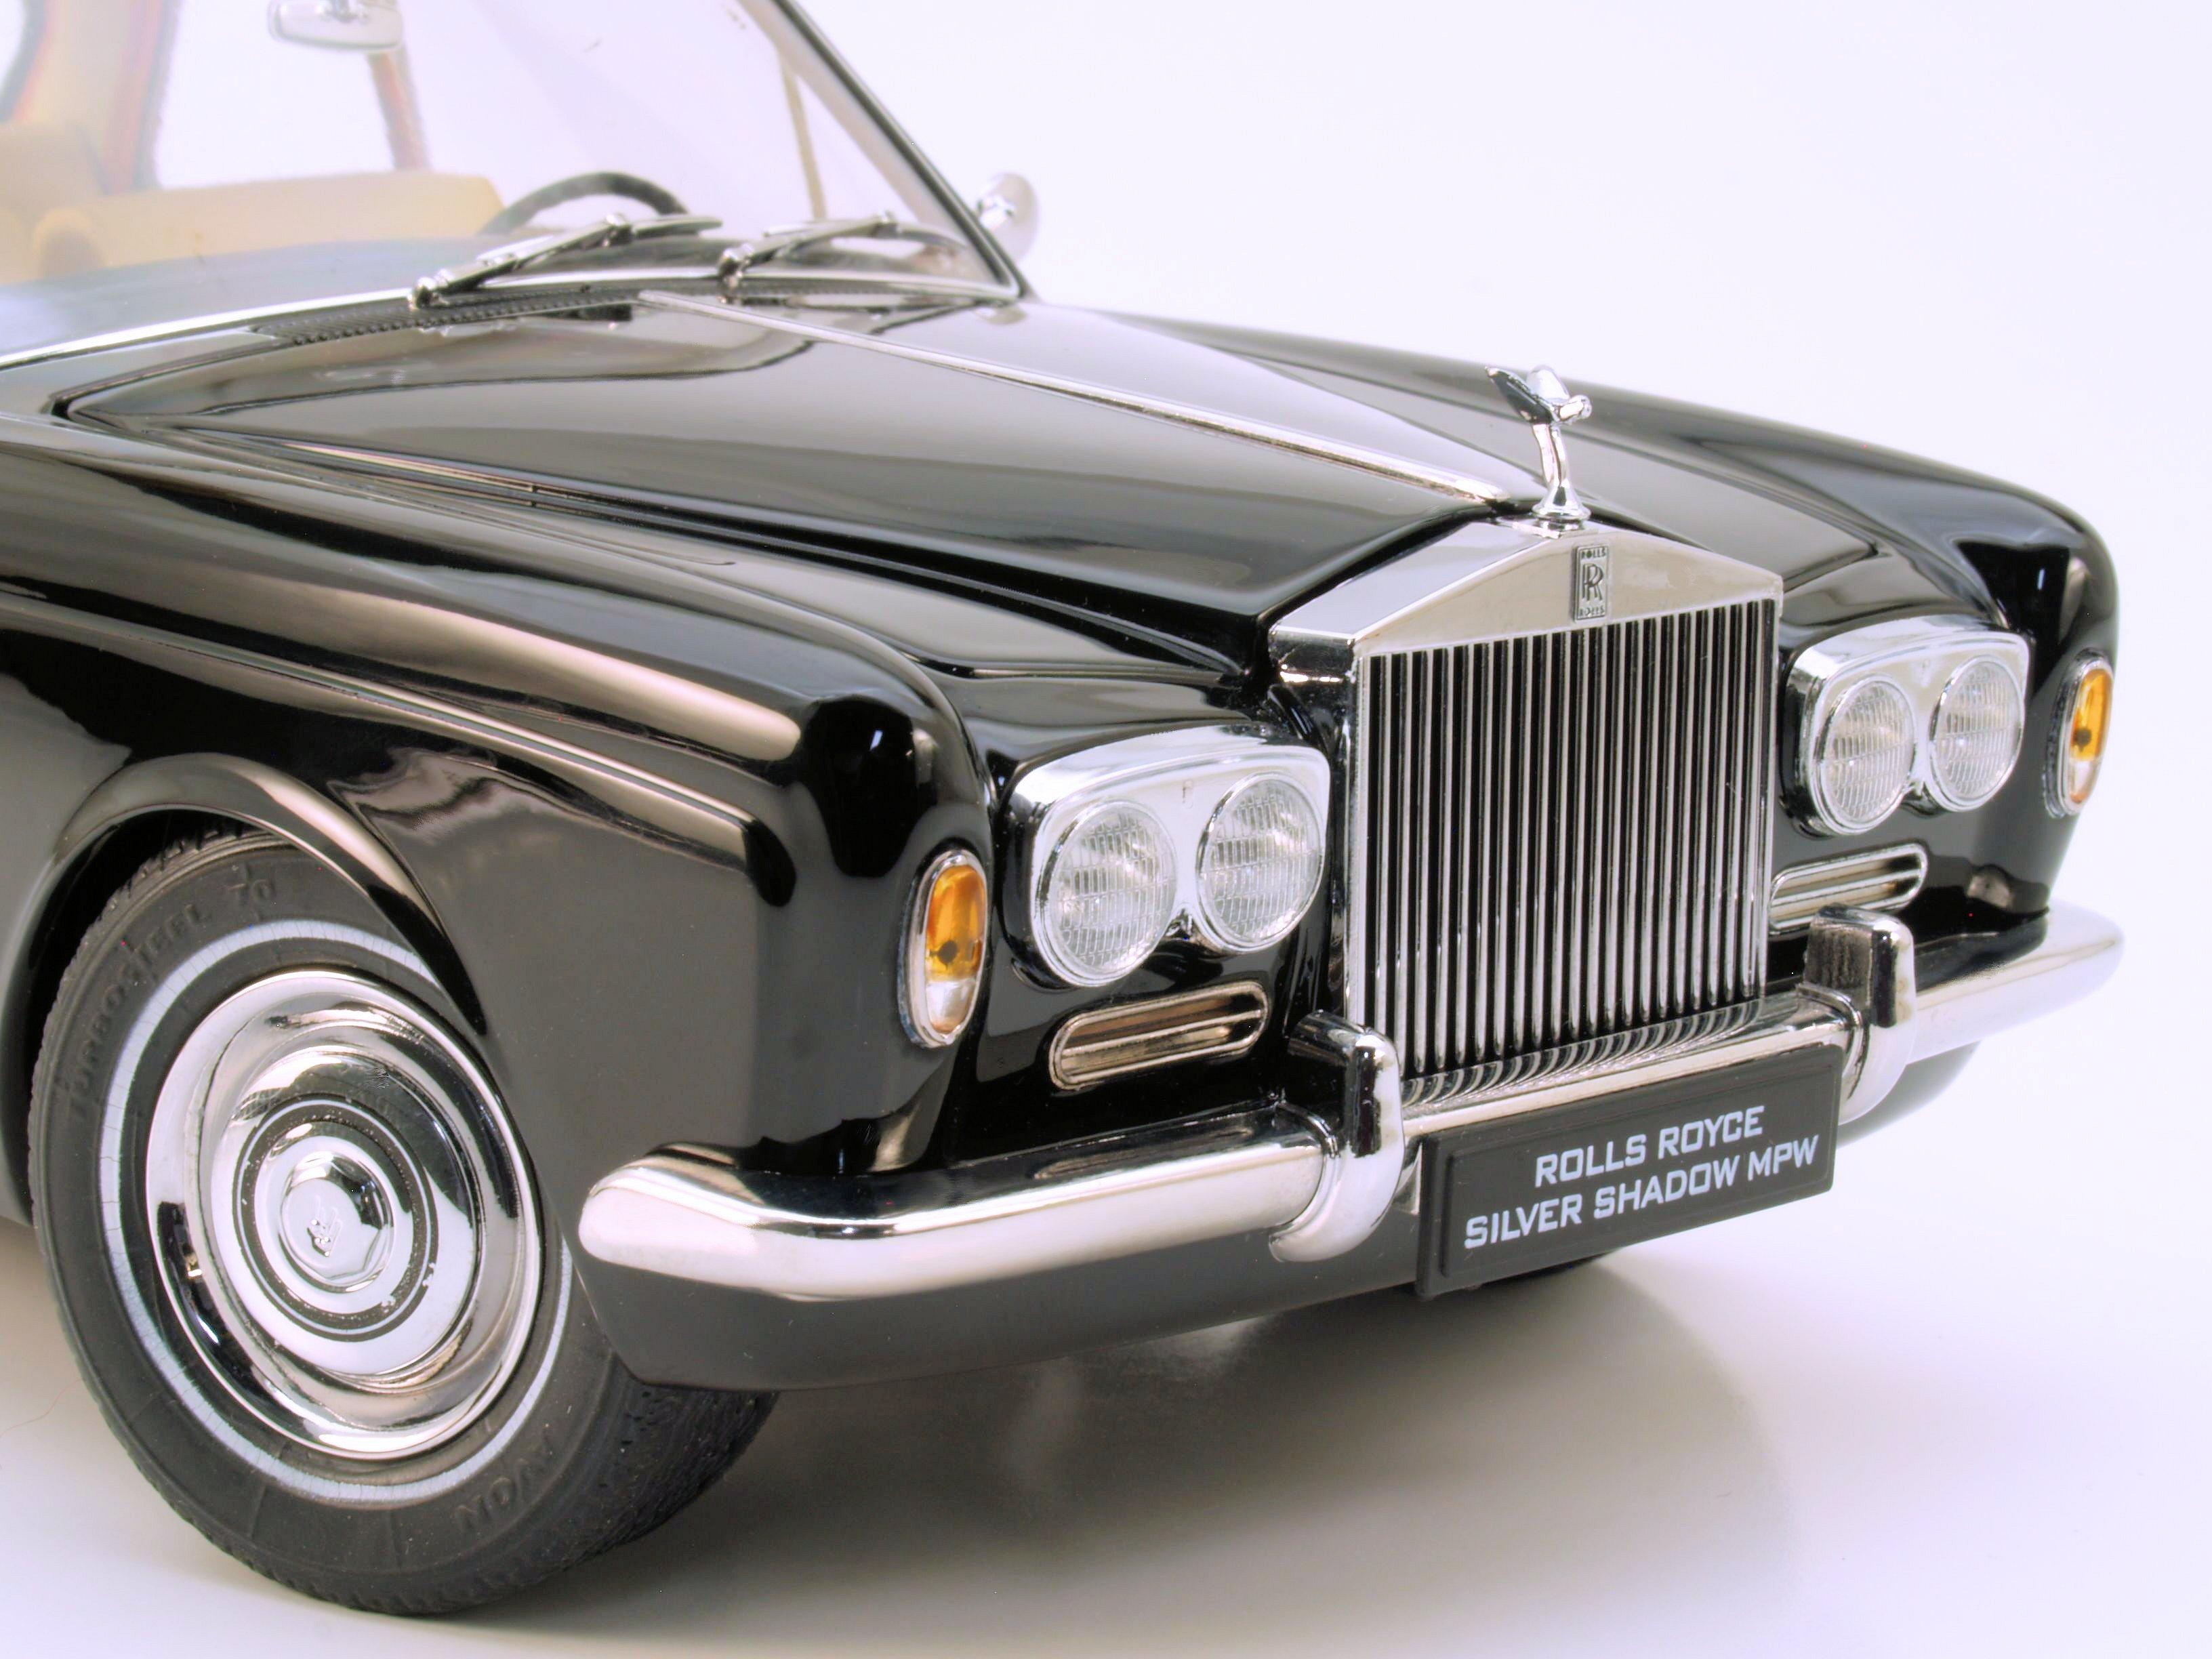 Bonus Photos / Snap Review: Paragon 1:18 1968 Rolls-Royce Mulliner Park Ward Coupe